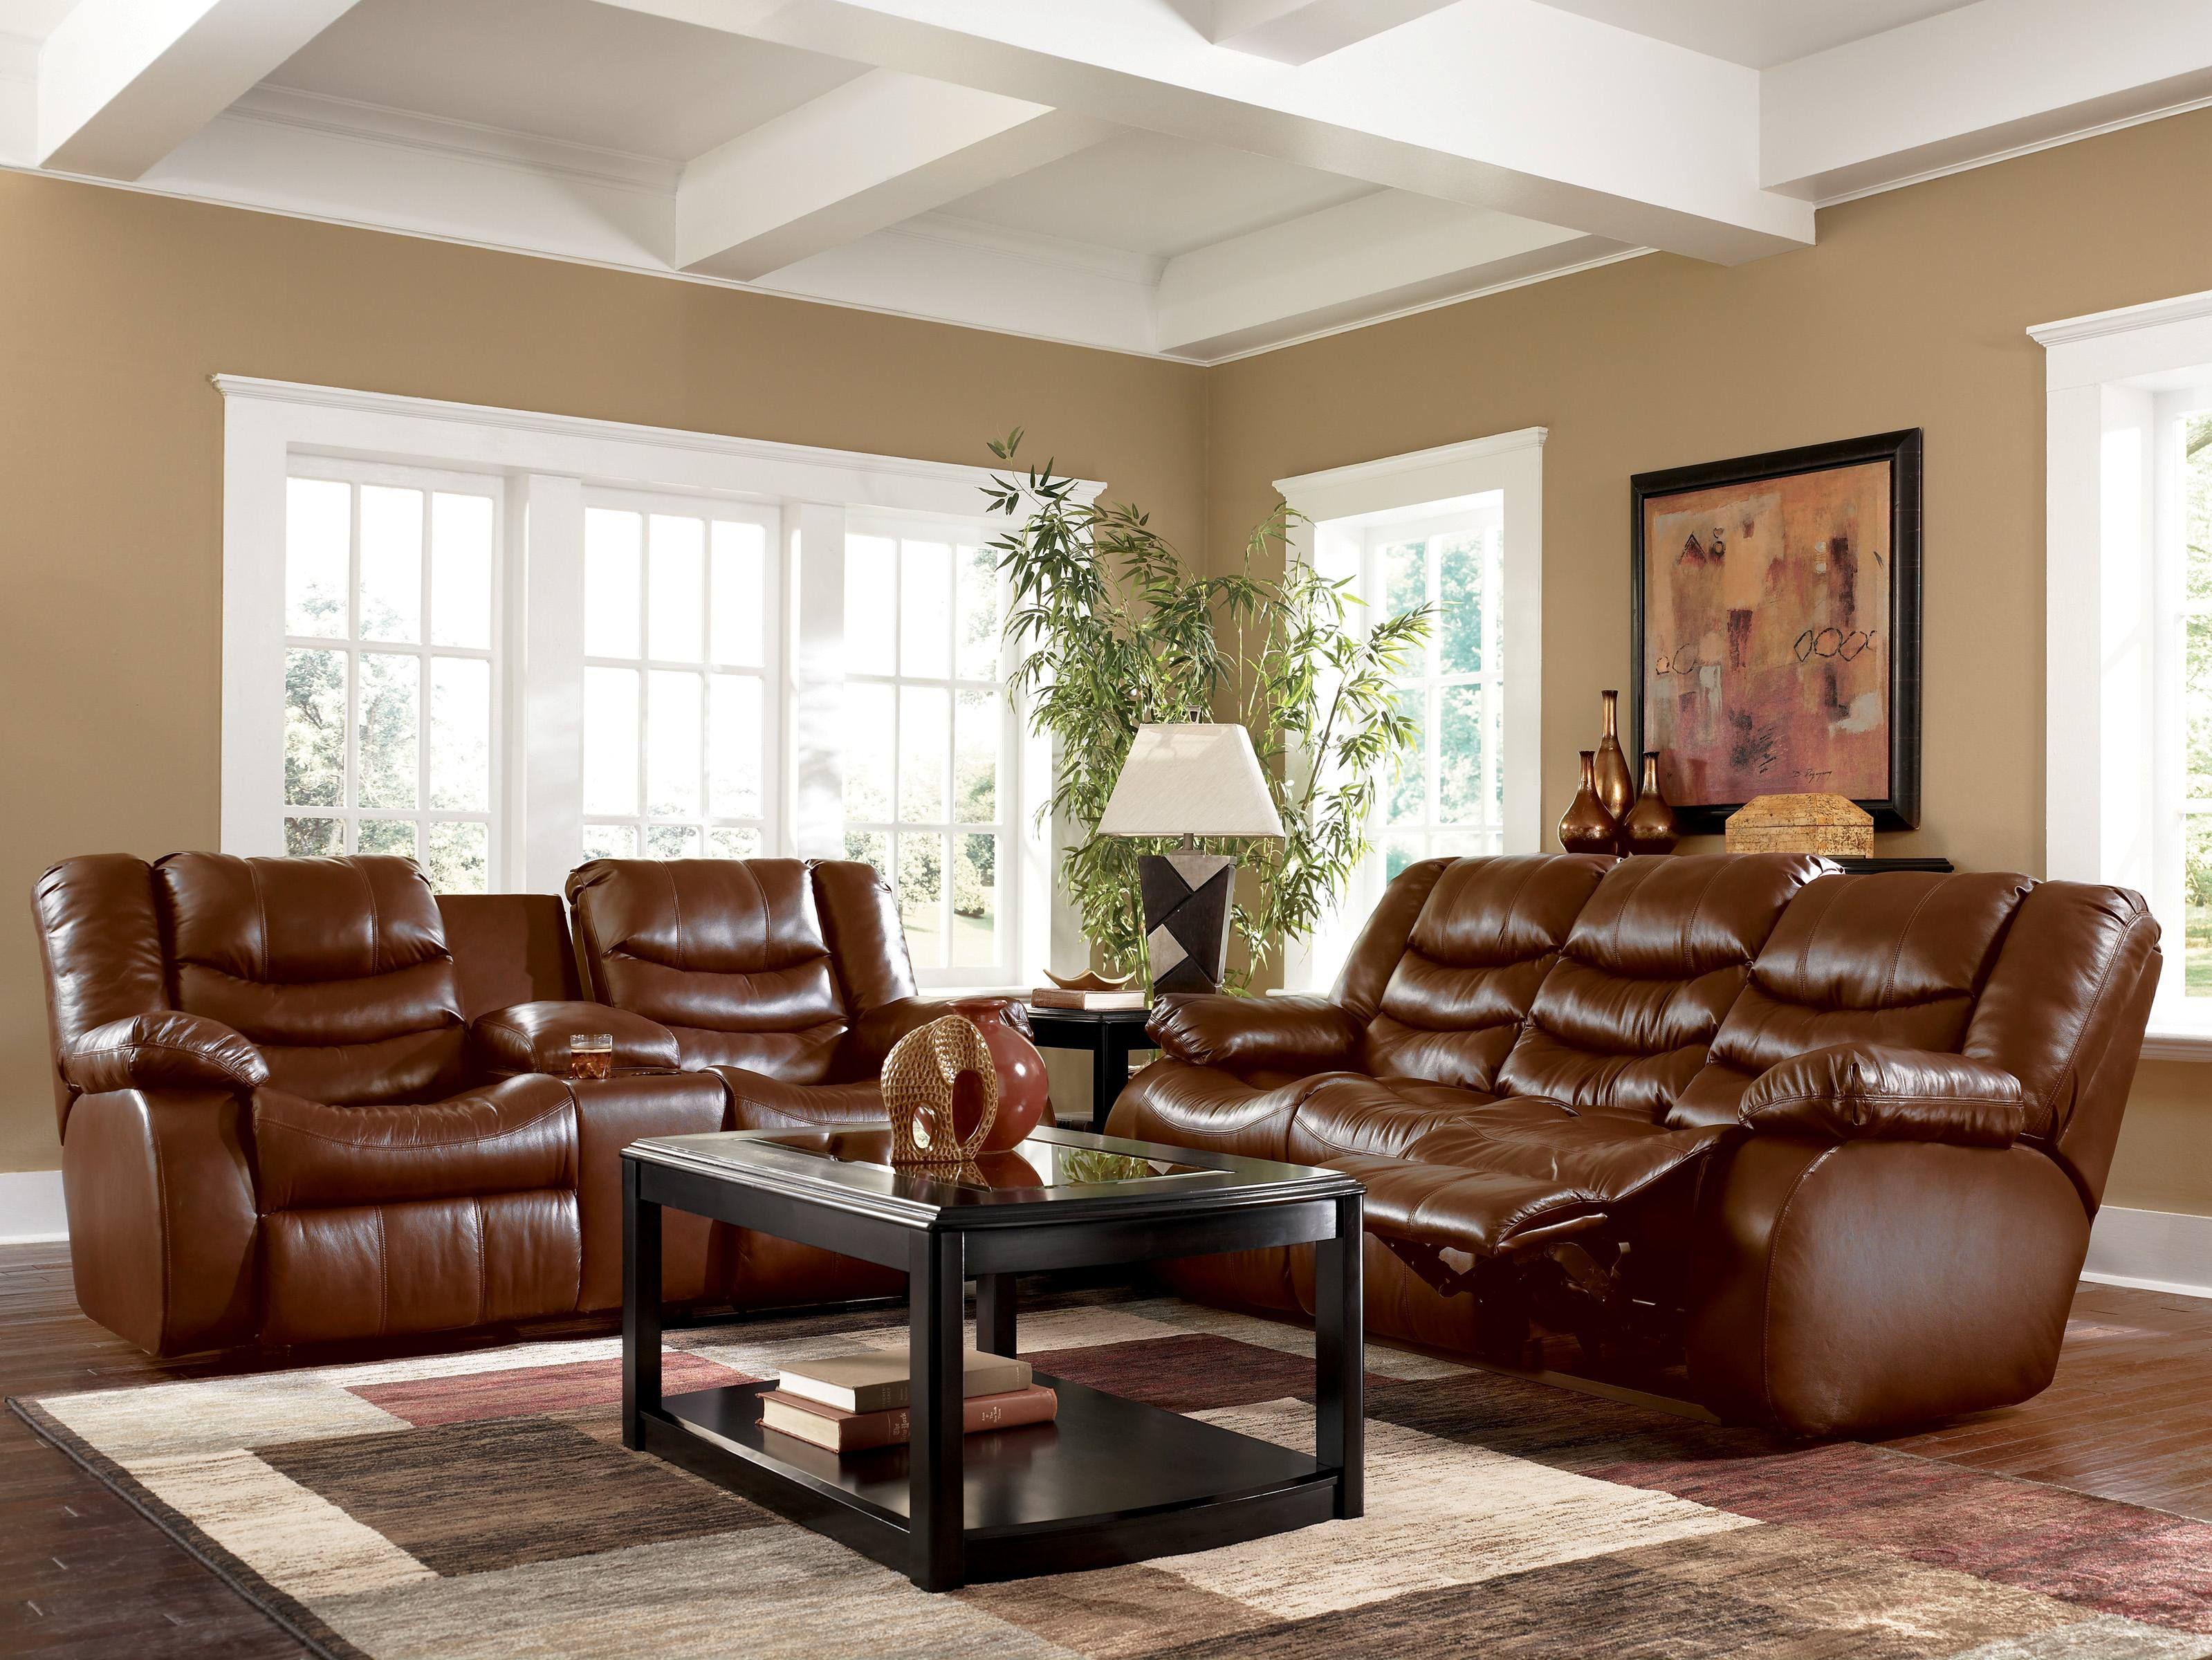 black leather living room furniture sets%0A Furniture    Image result for brown leather sofa